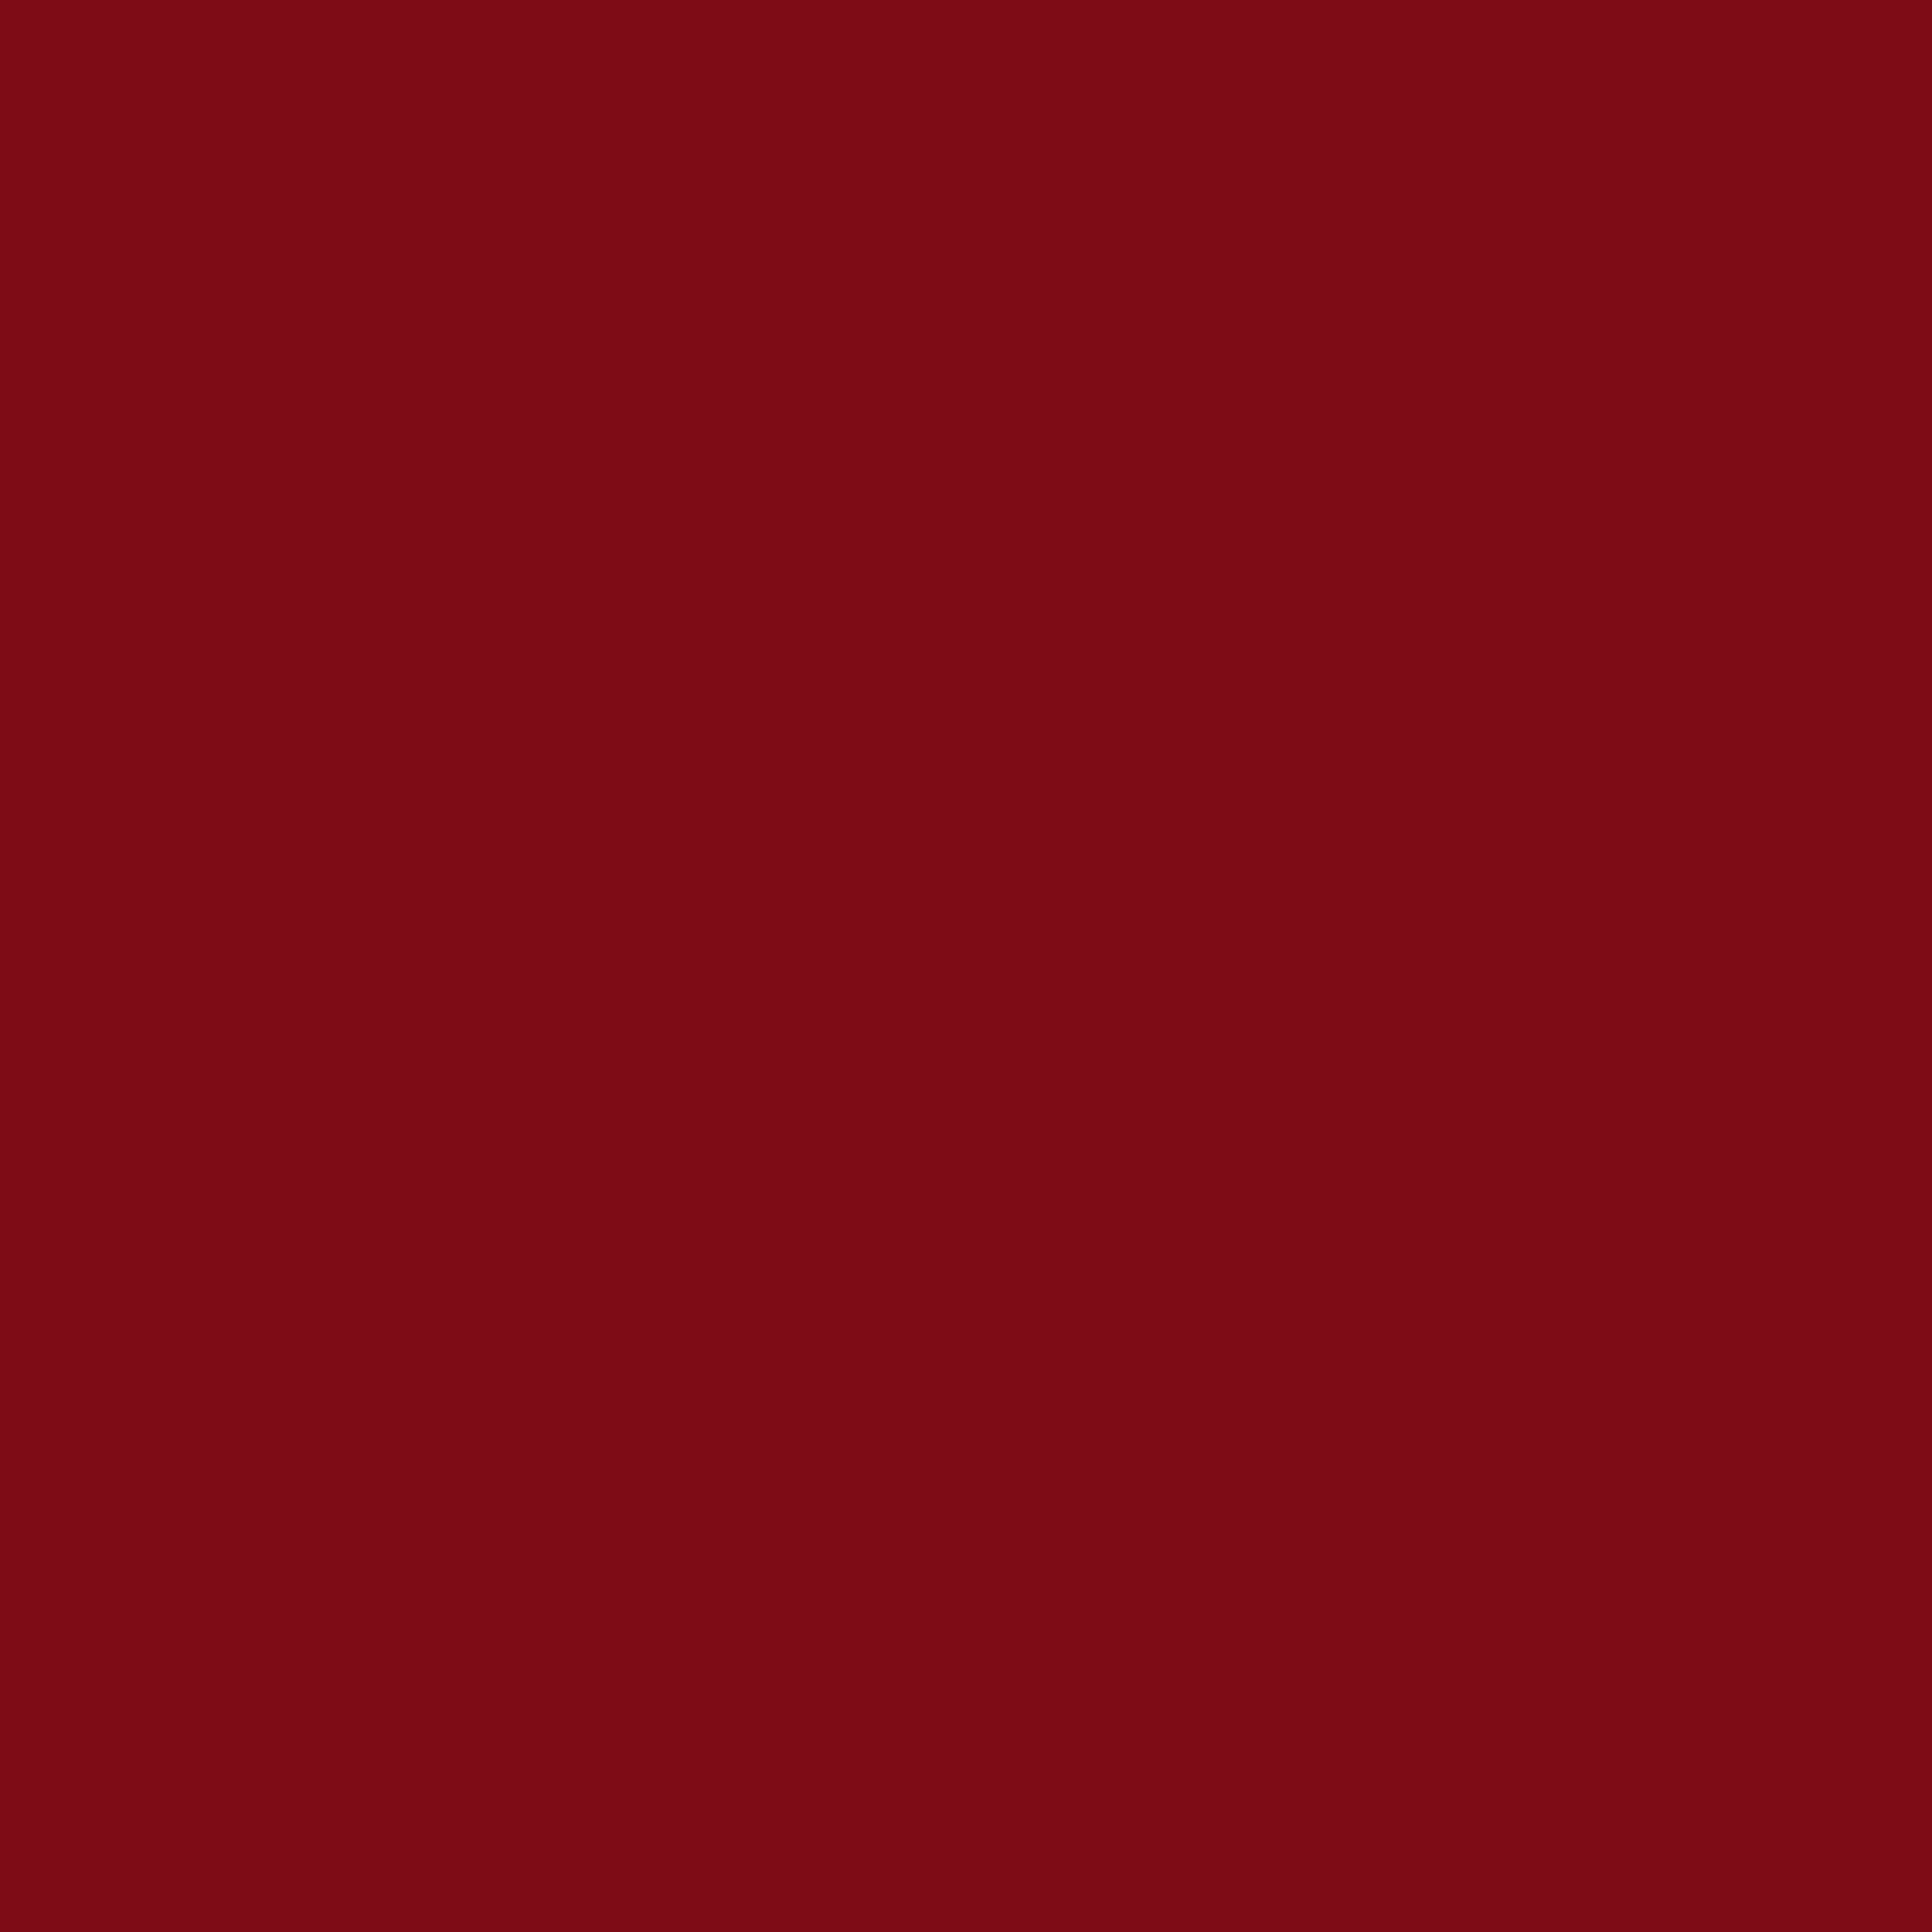 Red, Dakota